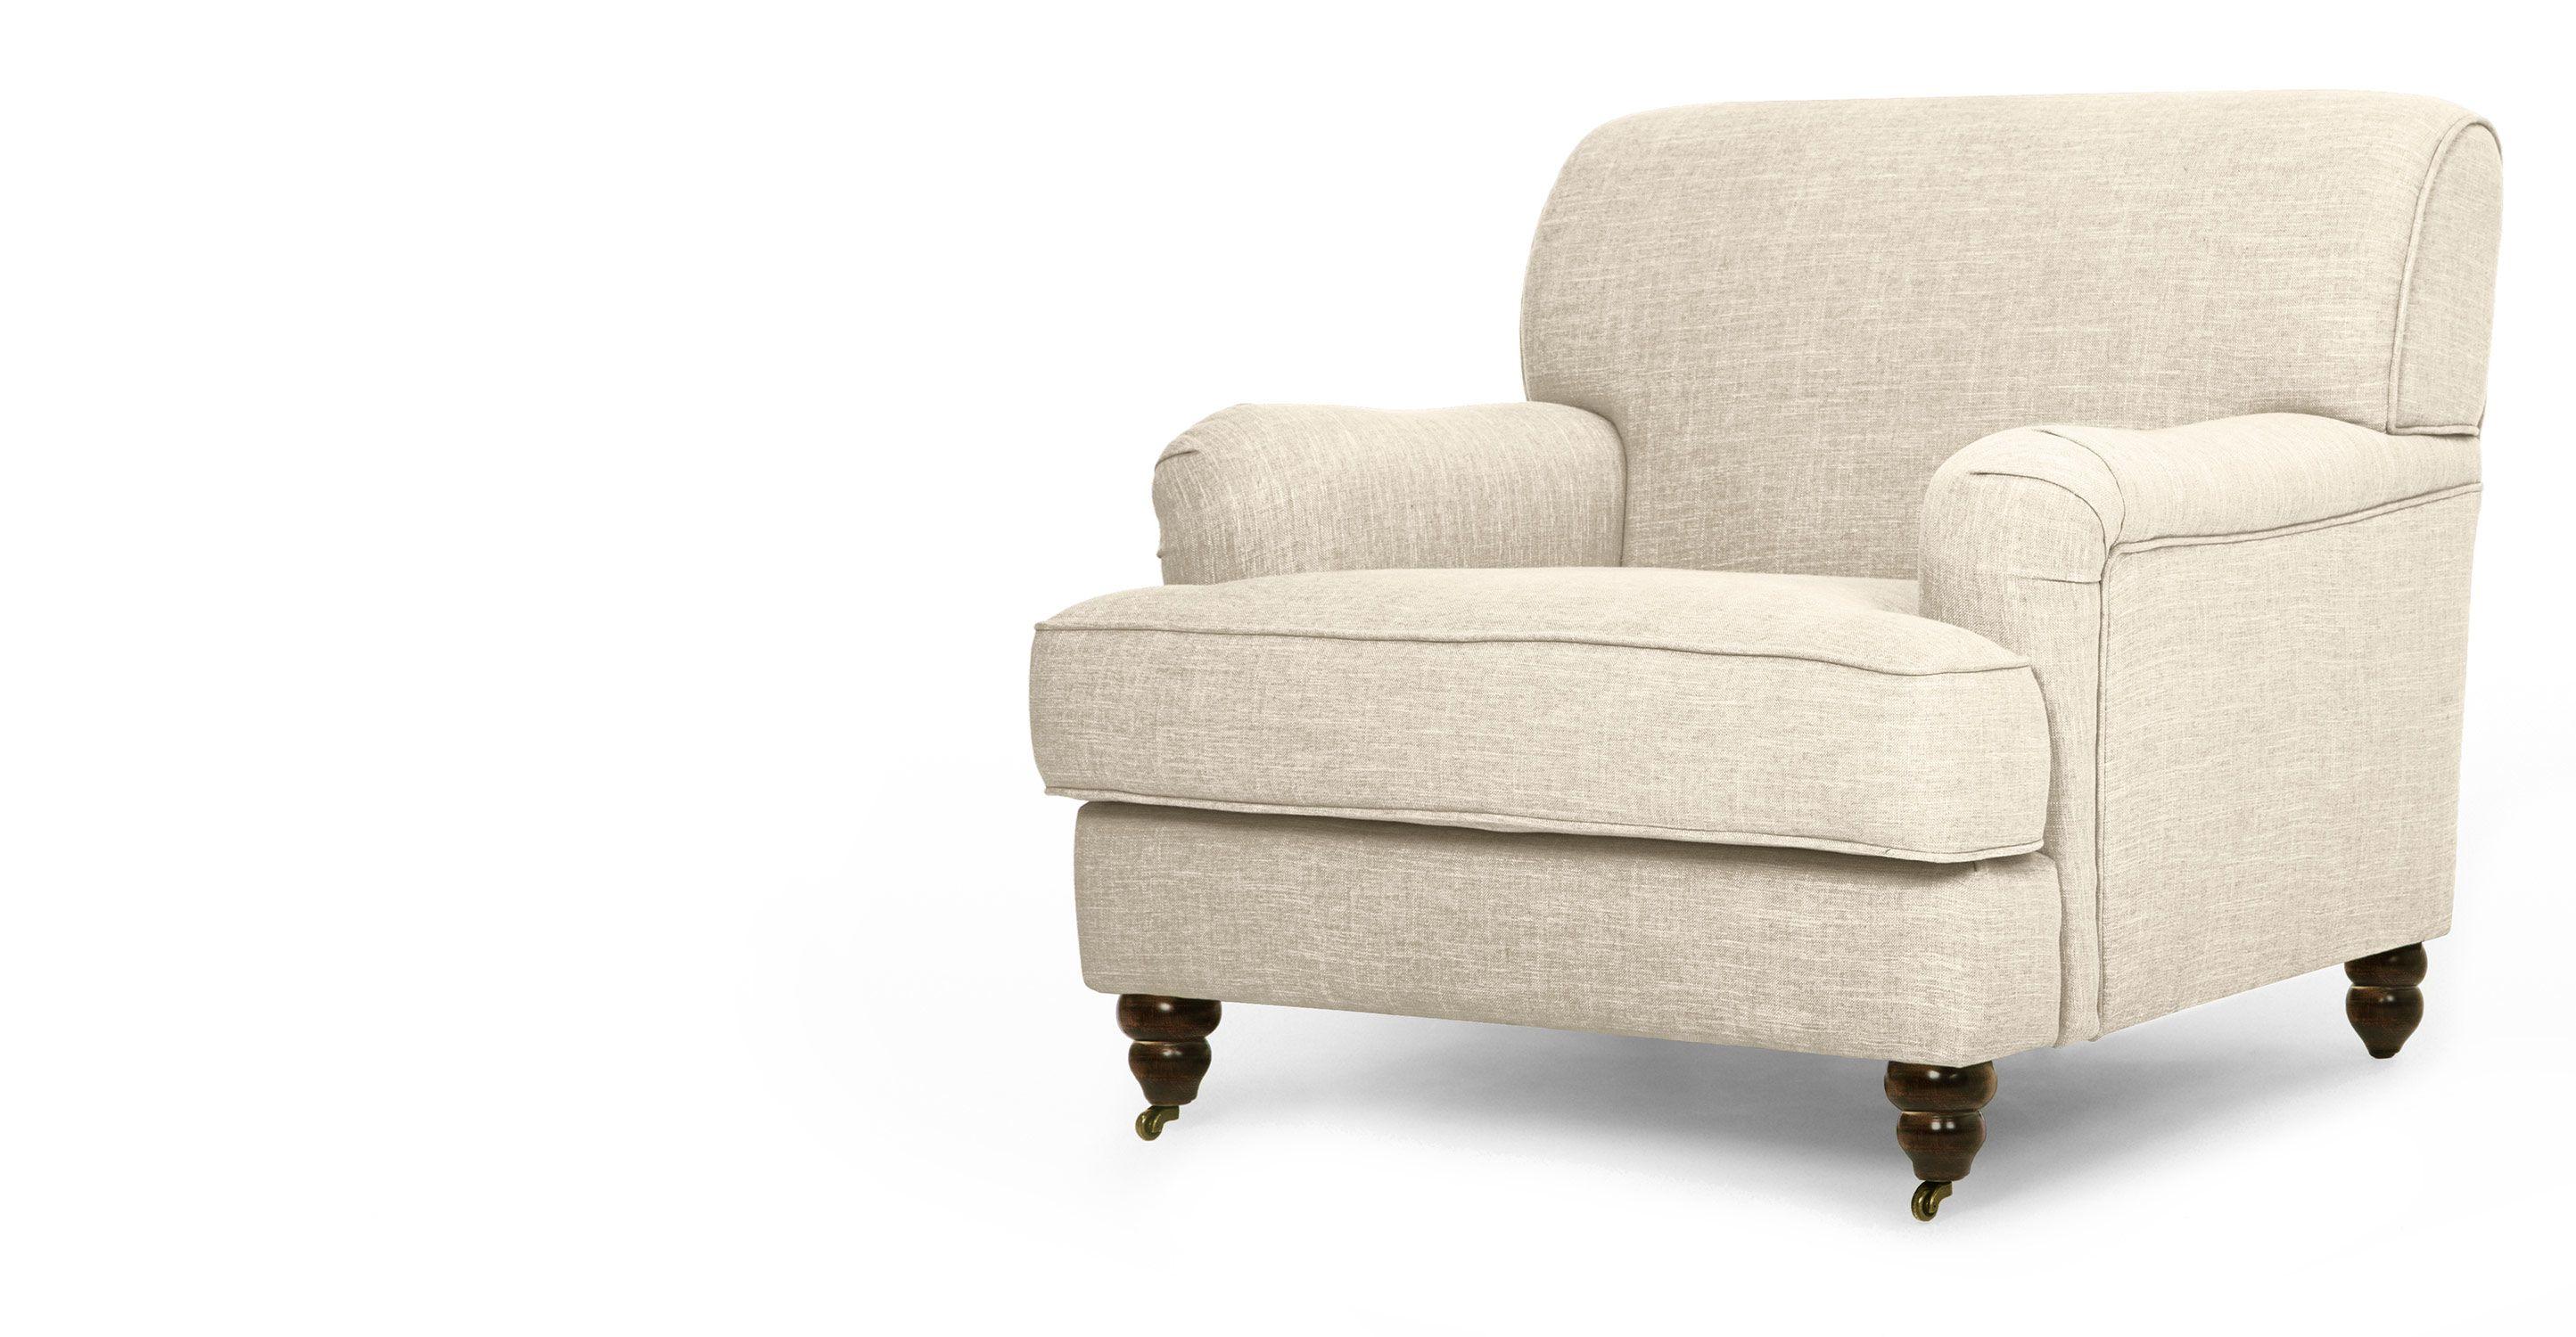 Orson Armchair in biscuit beige | made.com | Armchair ...